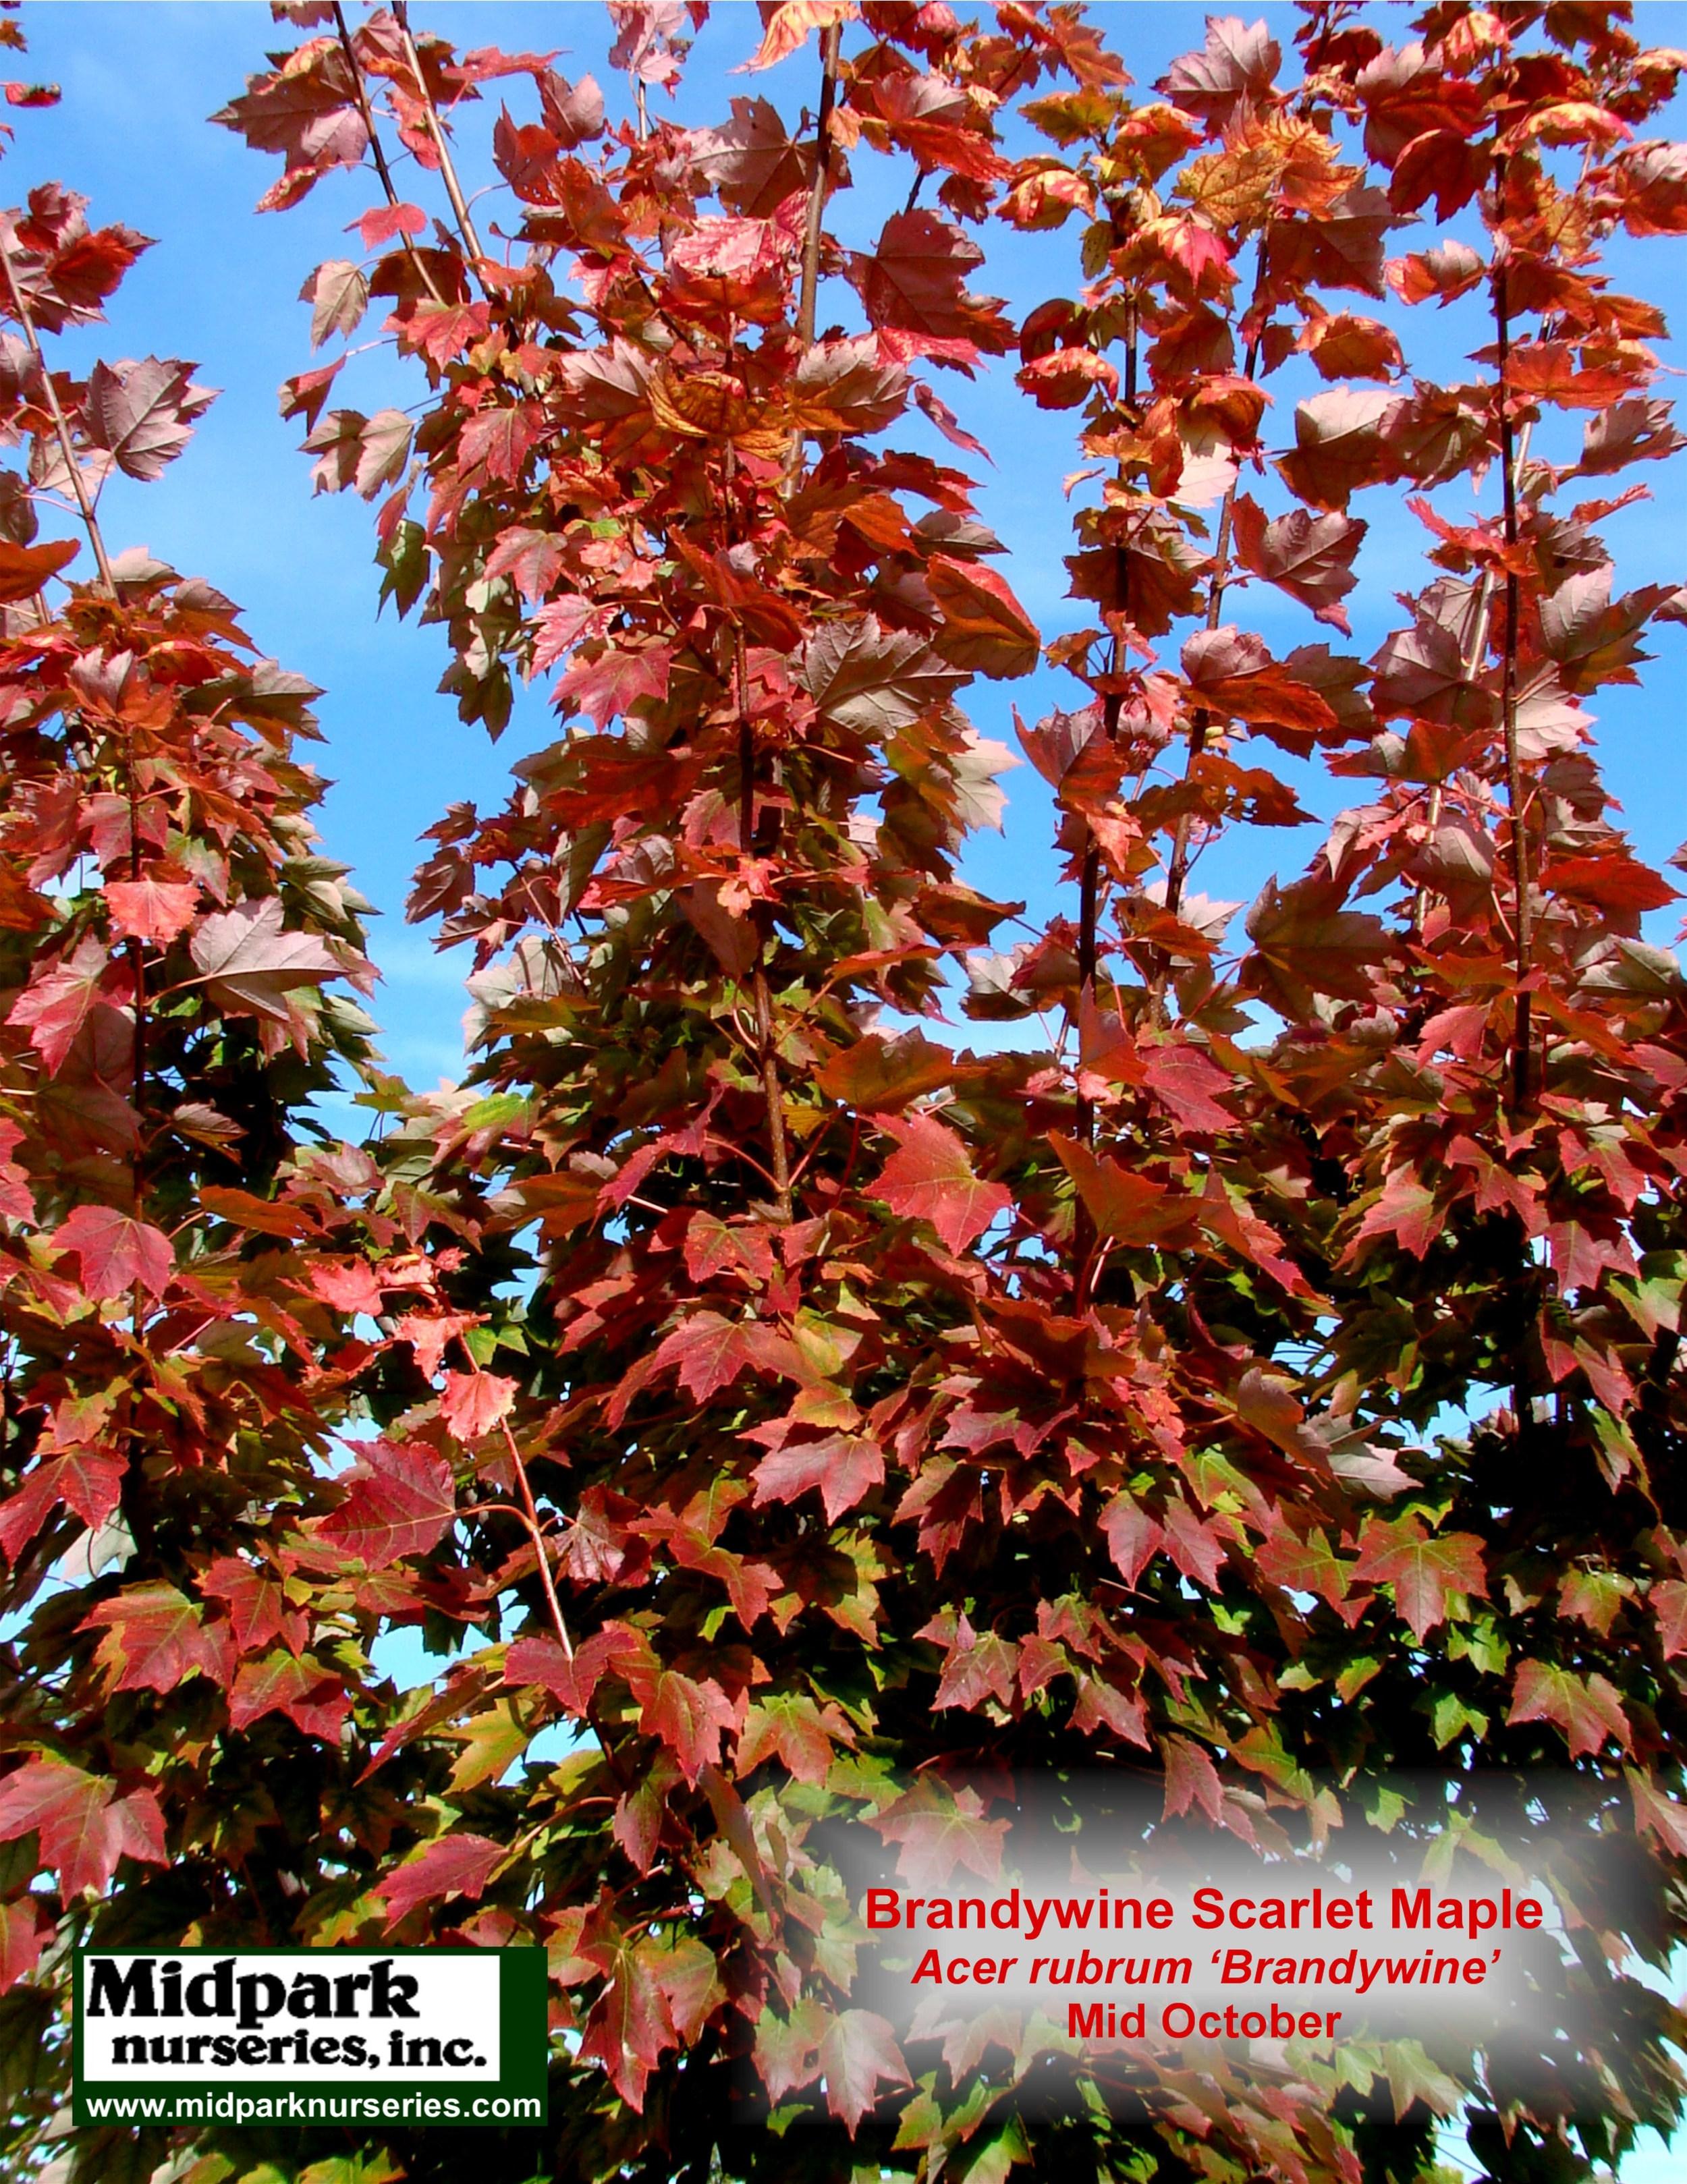 Brandywine Scarlet Maple